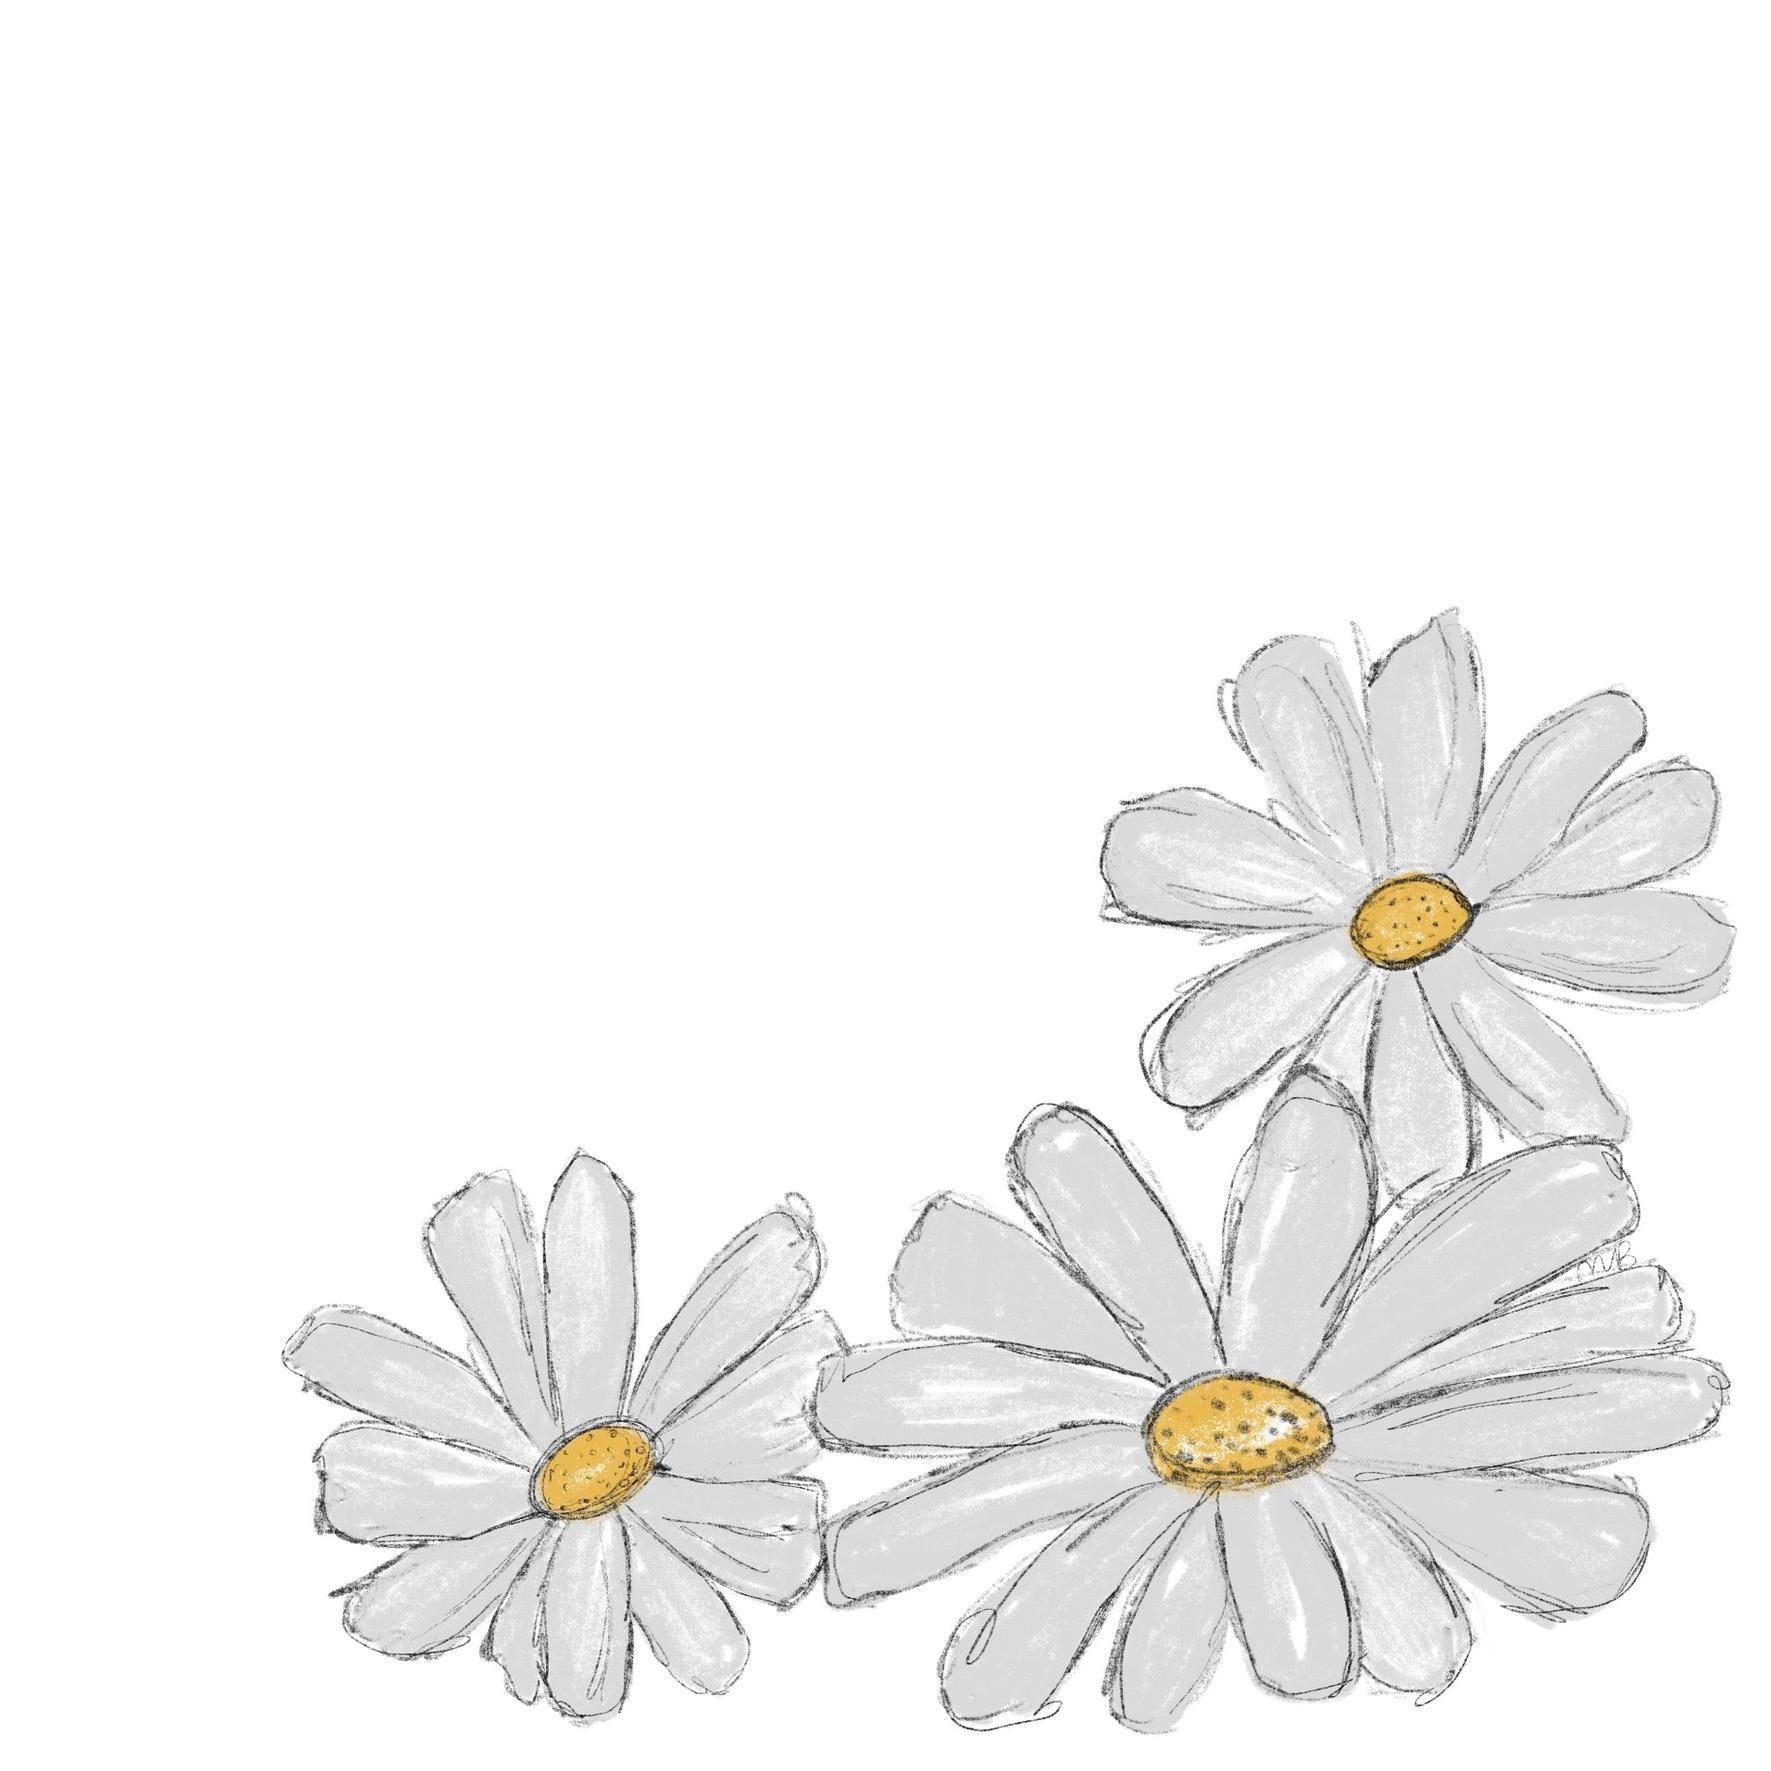 daisy-illustration-madison-beaulieu.JPG